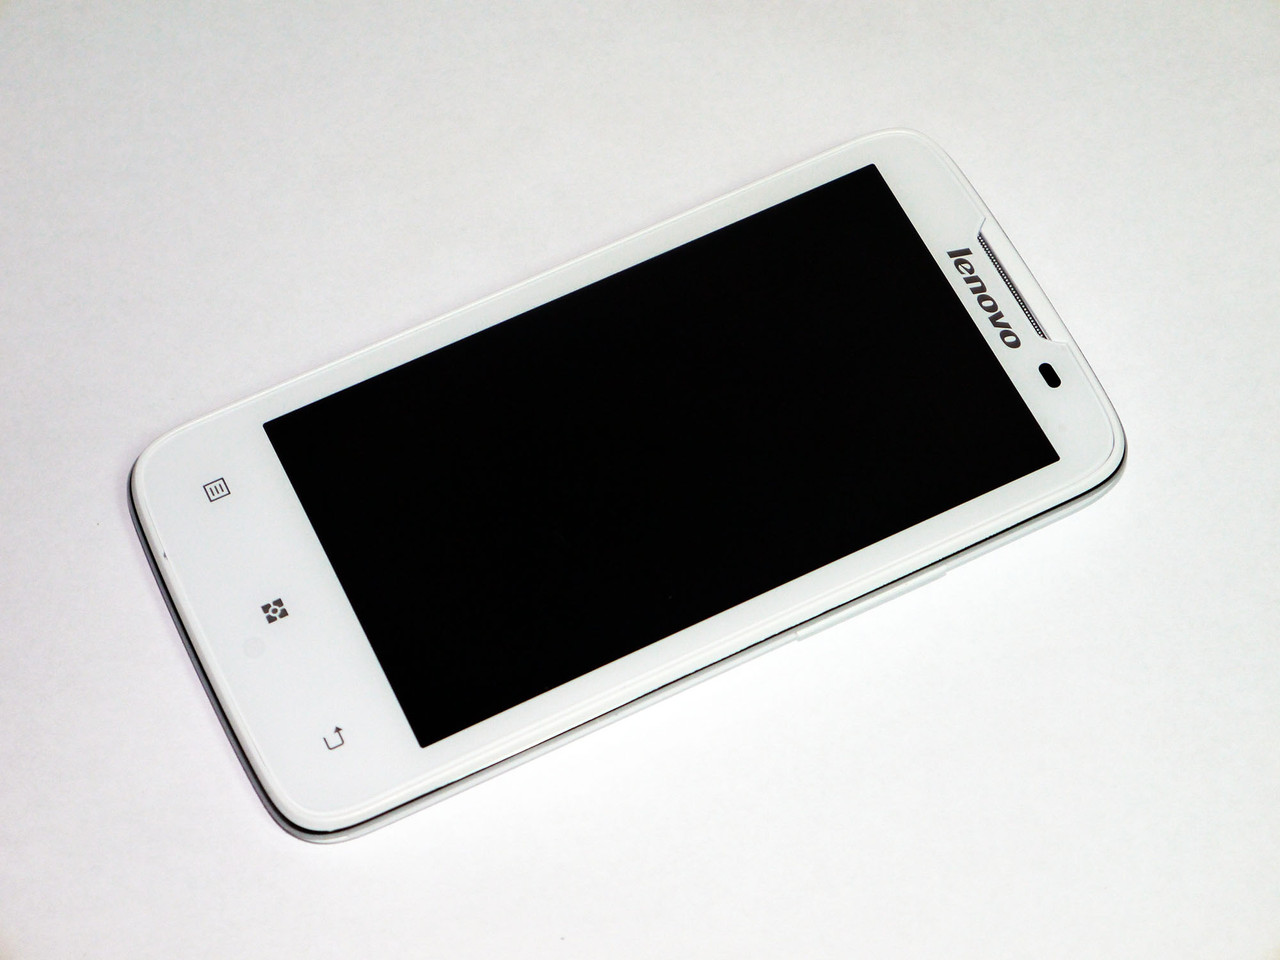 Телефон Lenovo A820 Белый 4,5'' IPS 13МП 4Ядра 1Gb ОЗУ, фото 1